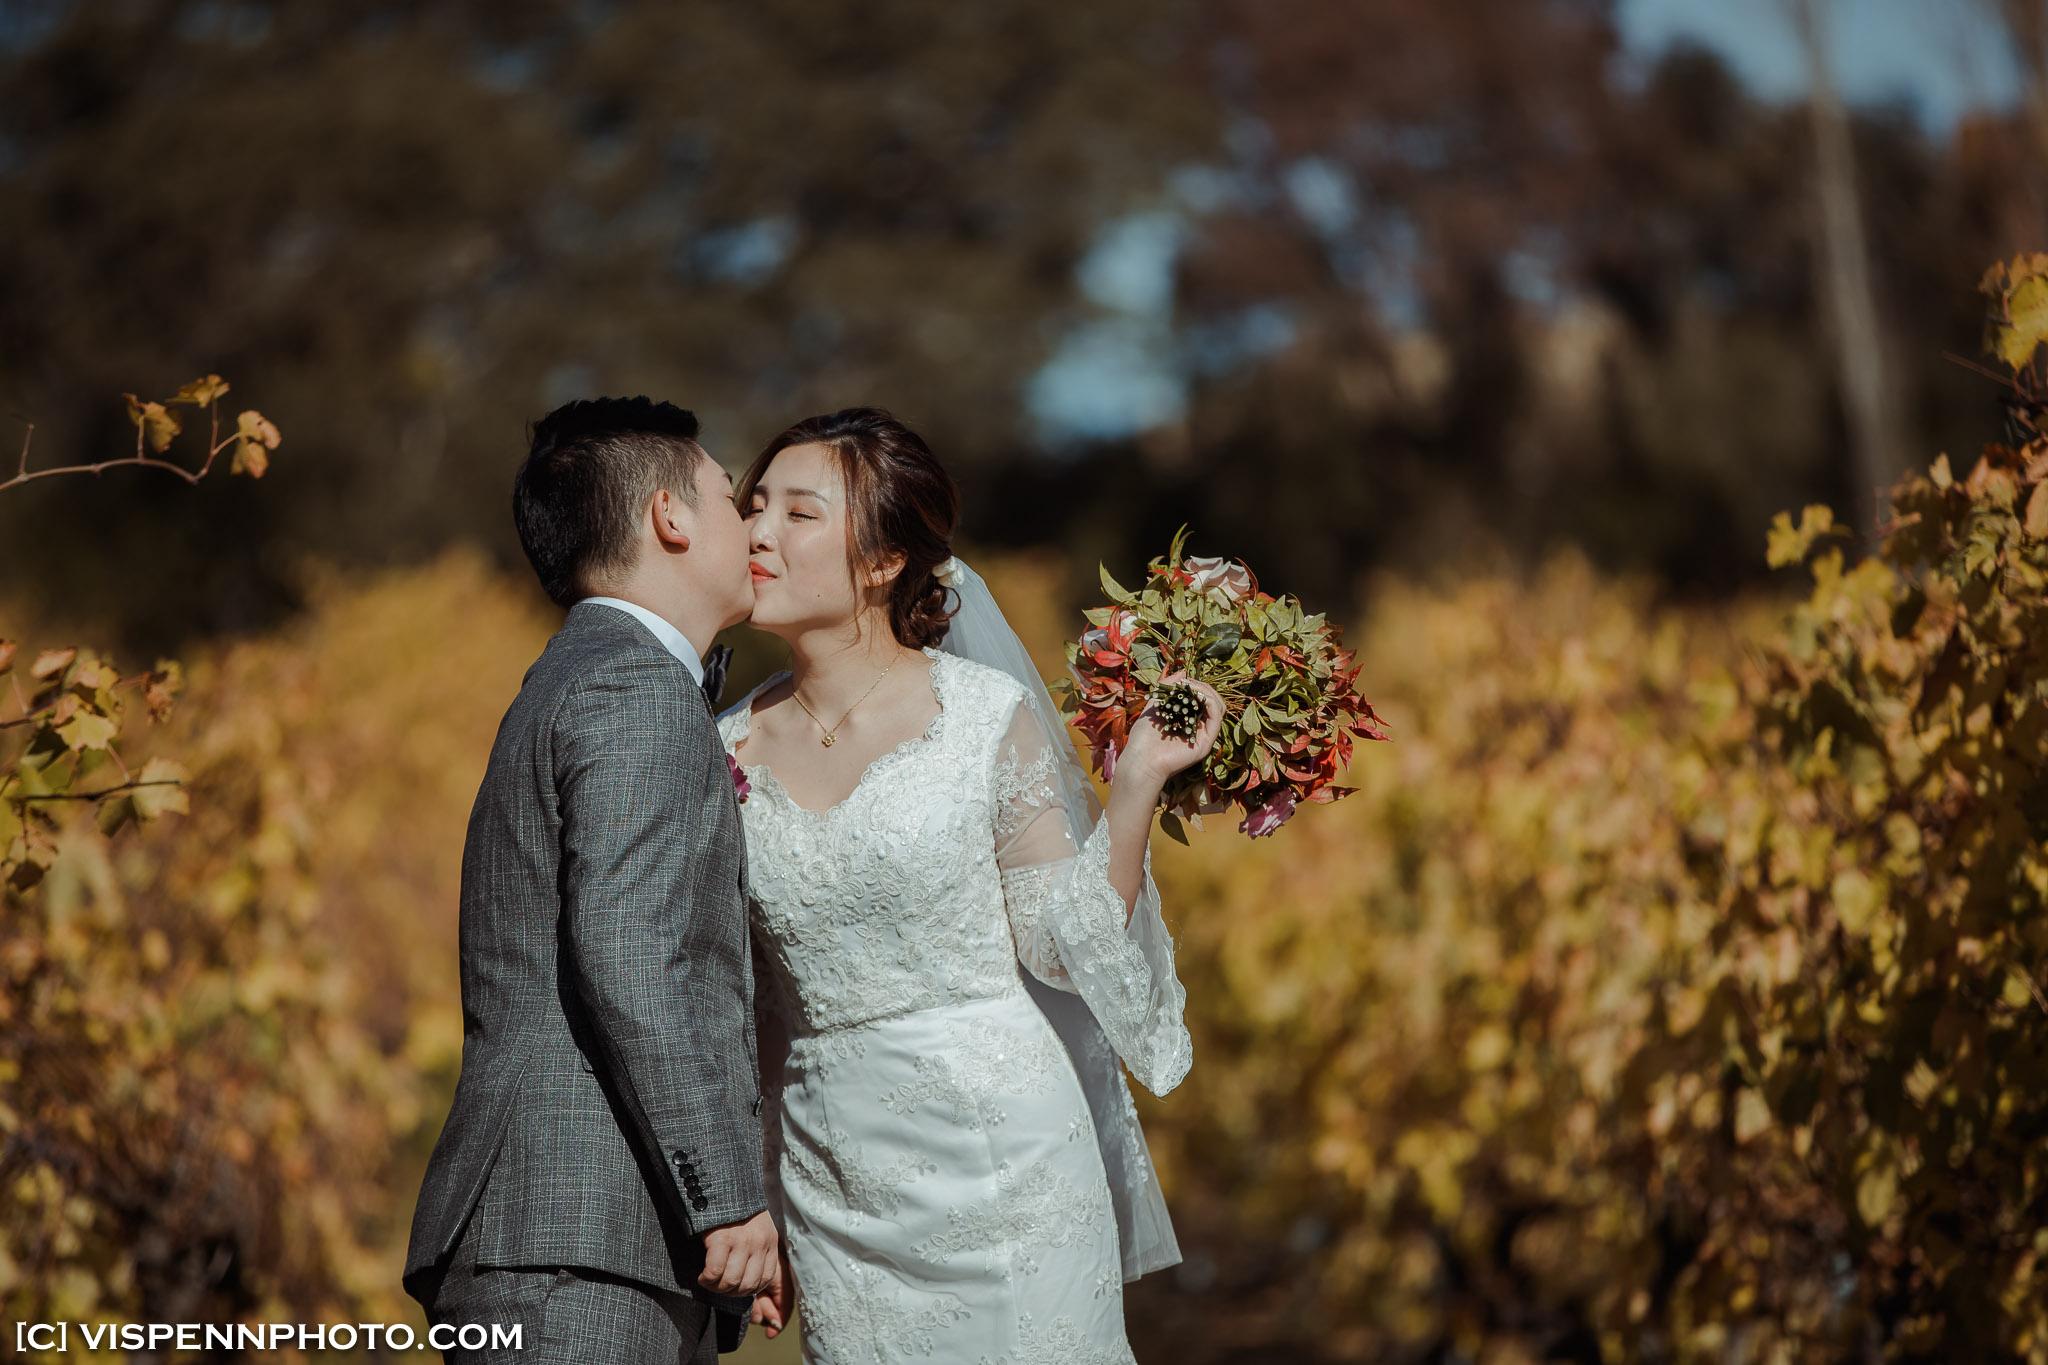 WEDDING DAY Photography Melbourne VISPENN 墨尔本 婚礼跟拍 婚礼摄像 婚礼摄影 结婚照 登记照 DominicHelen 2P 5965 1DX2 VISPENN